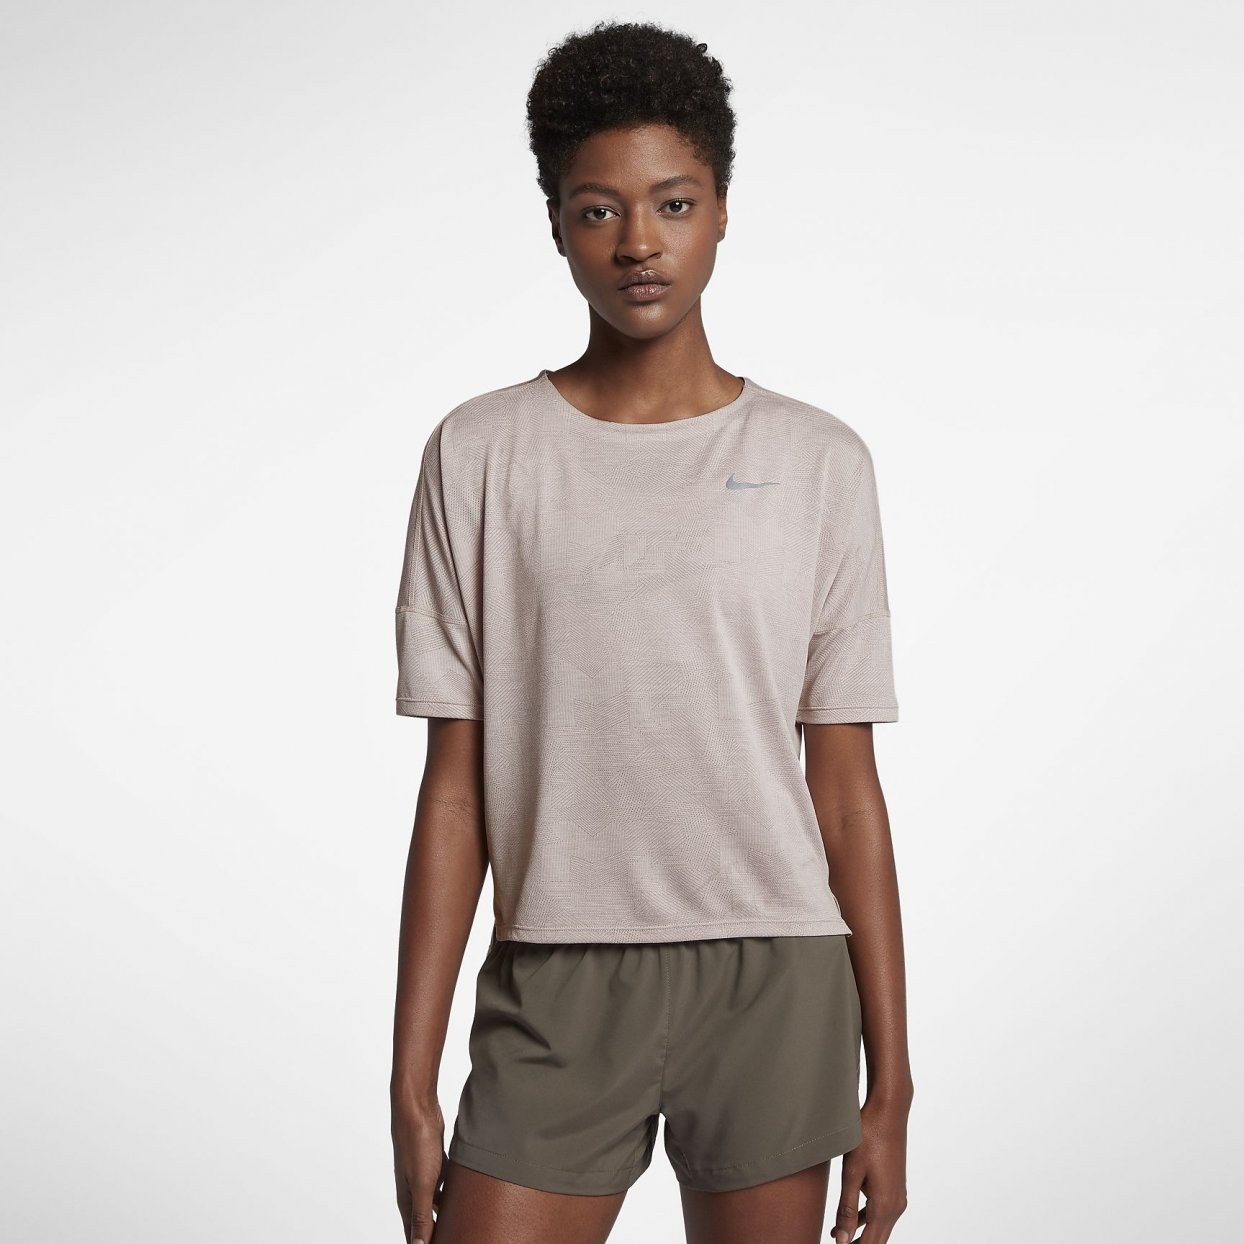 Nike Dry-Fit Medalist Short Sleeve dame